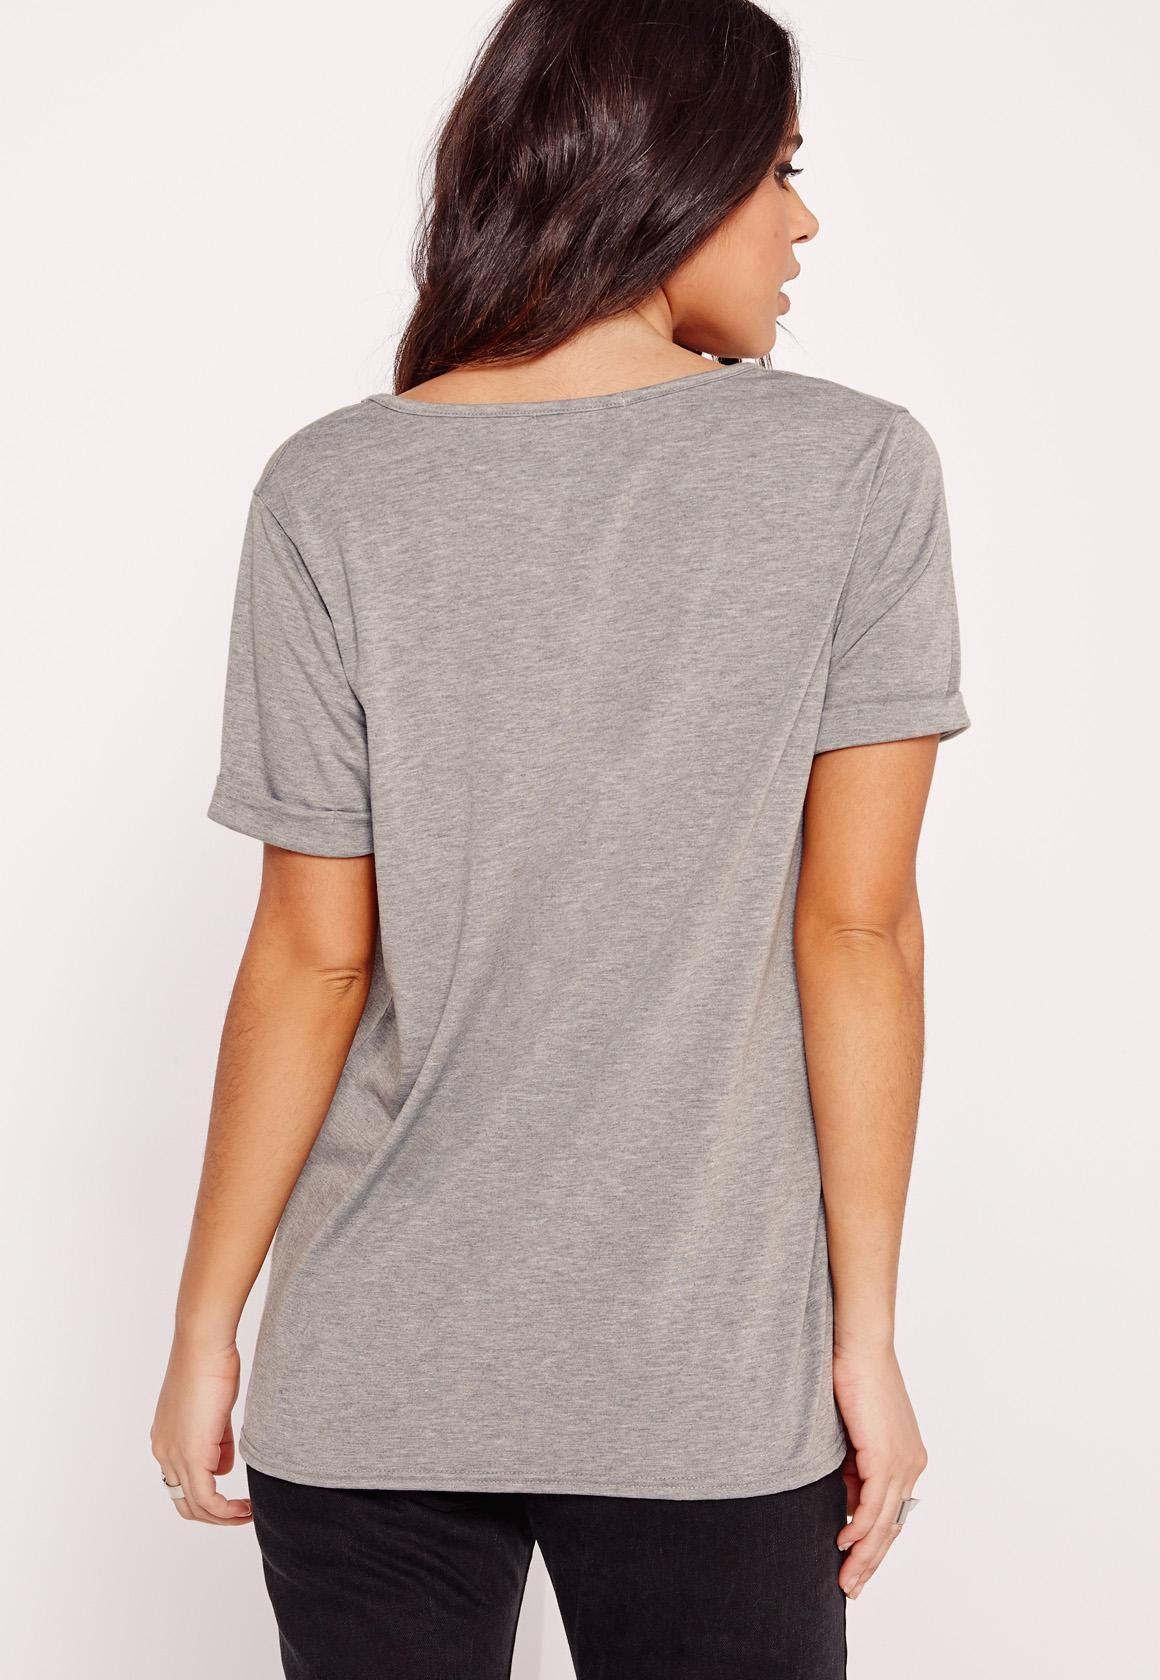 Lyst missguided boyfriend v neck t shirt grey marl in gray for Grey marl t shirt